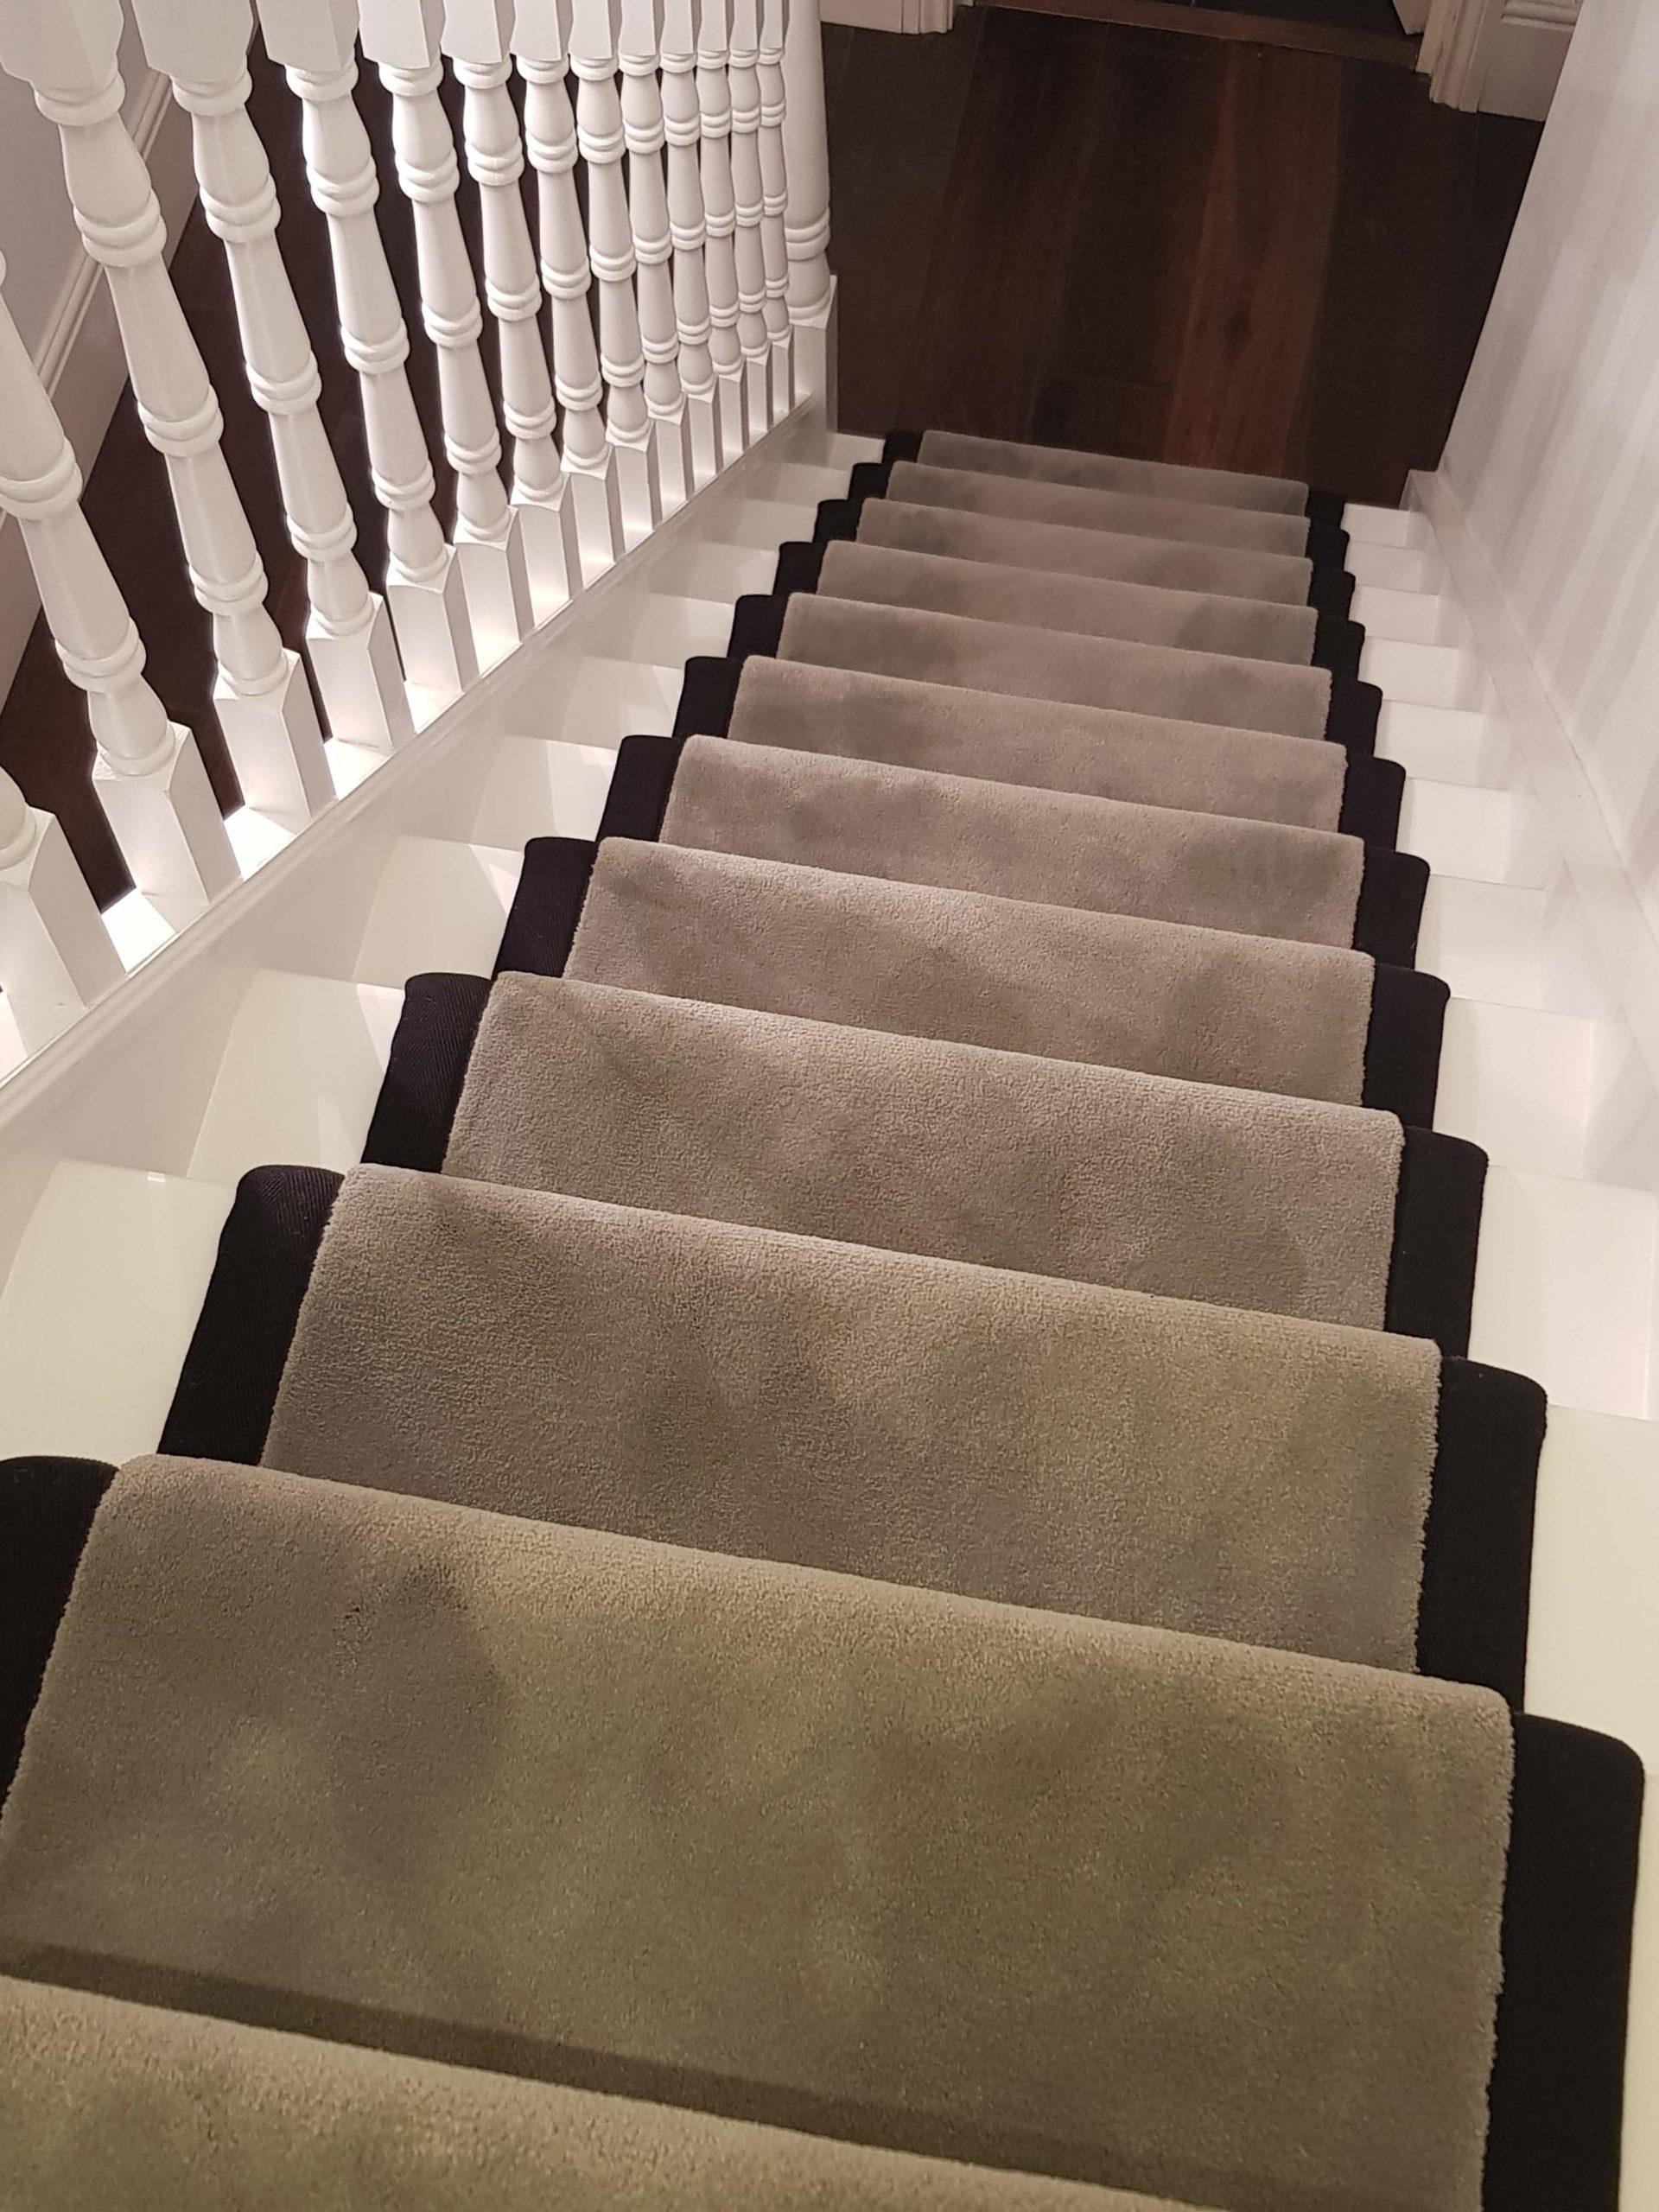 Kensington grey carpet with black border